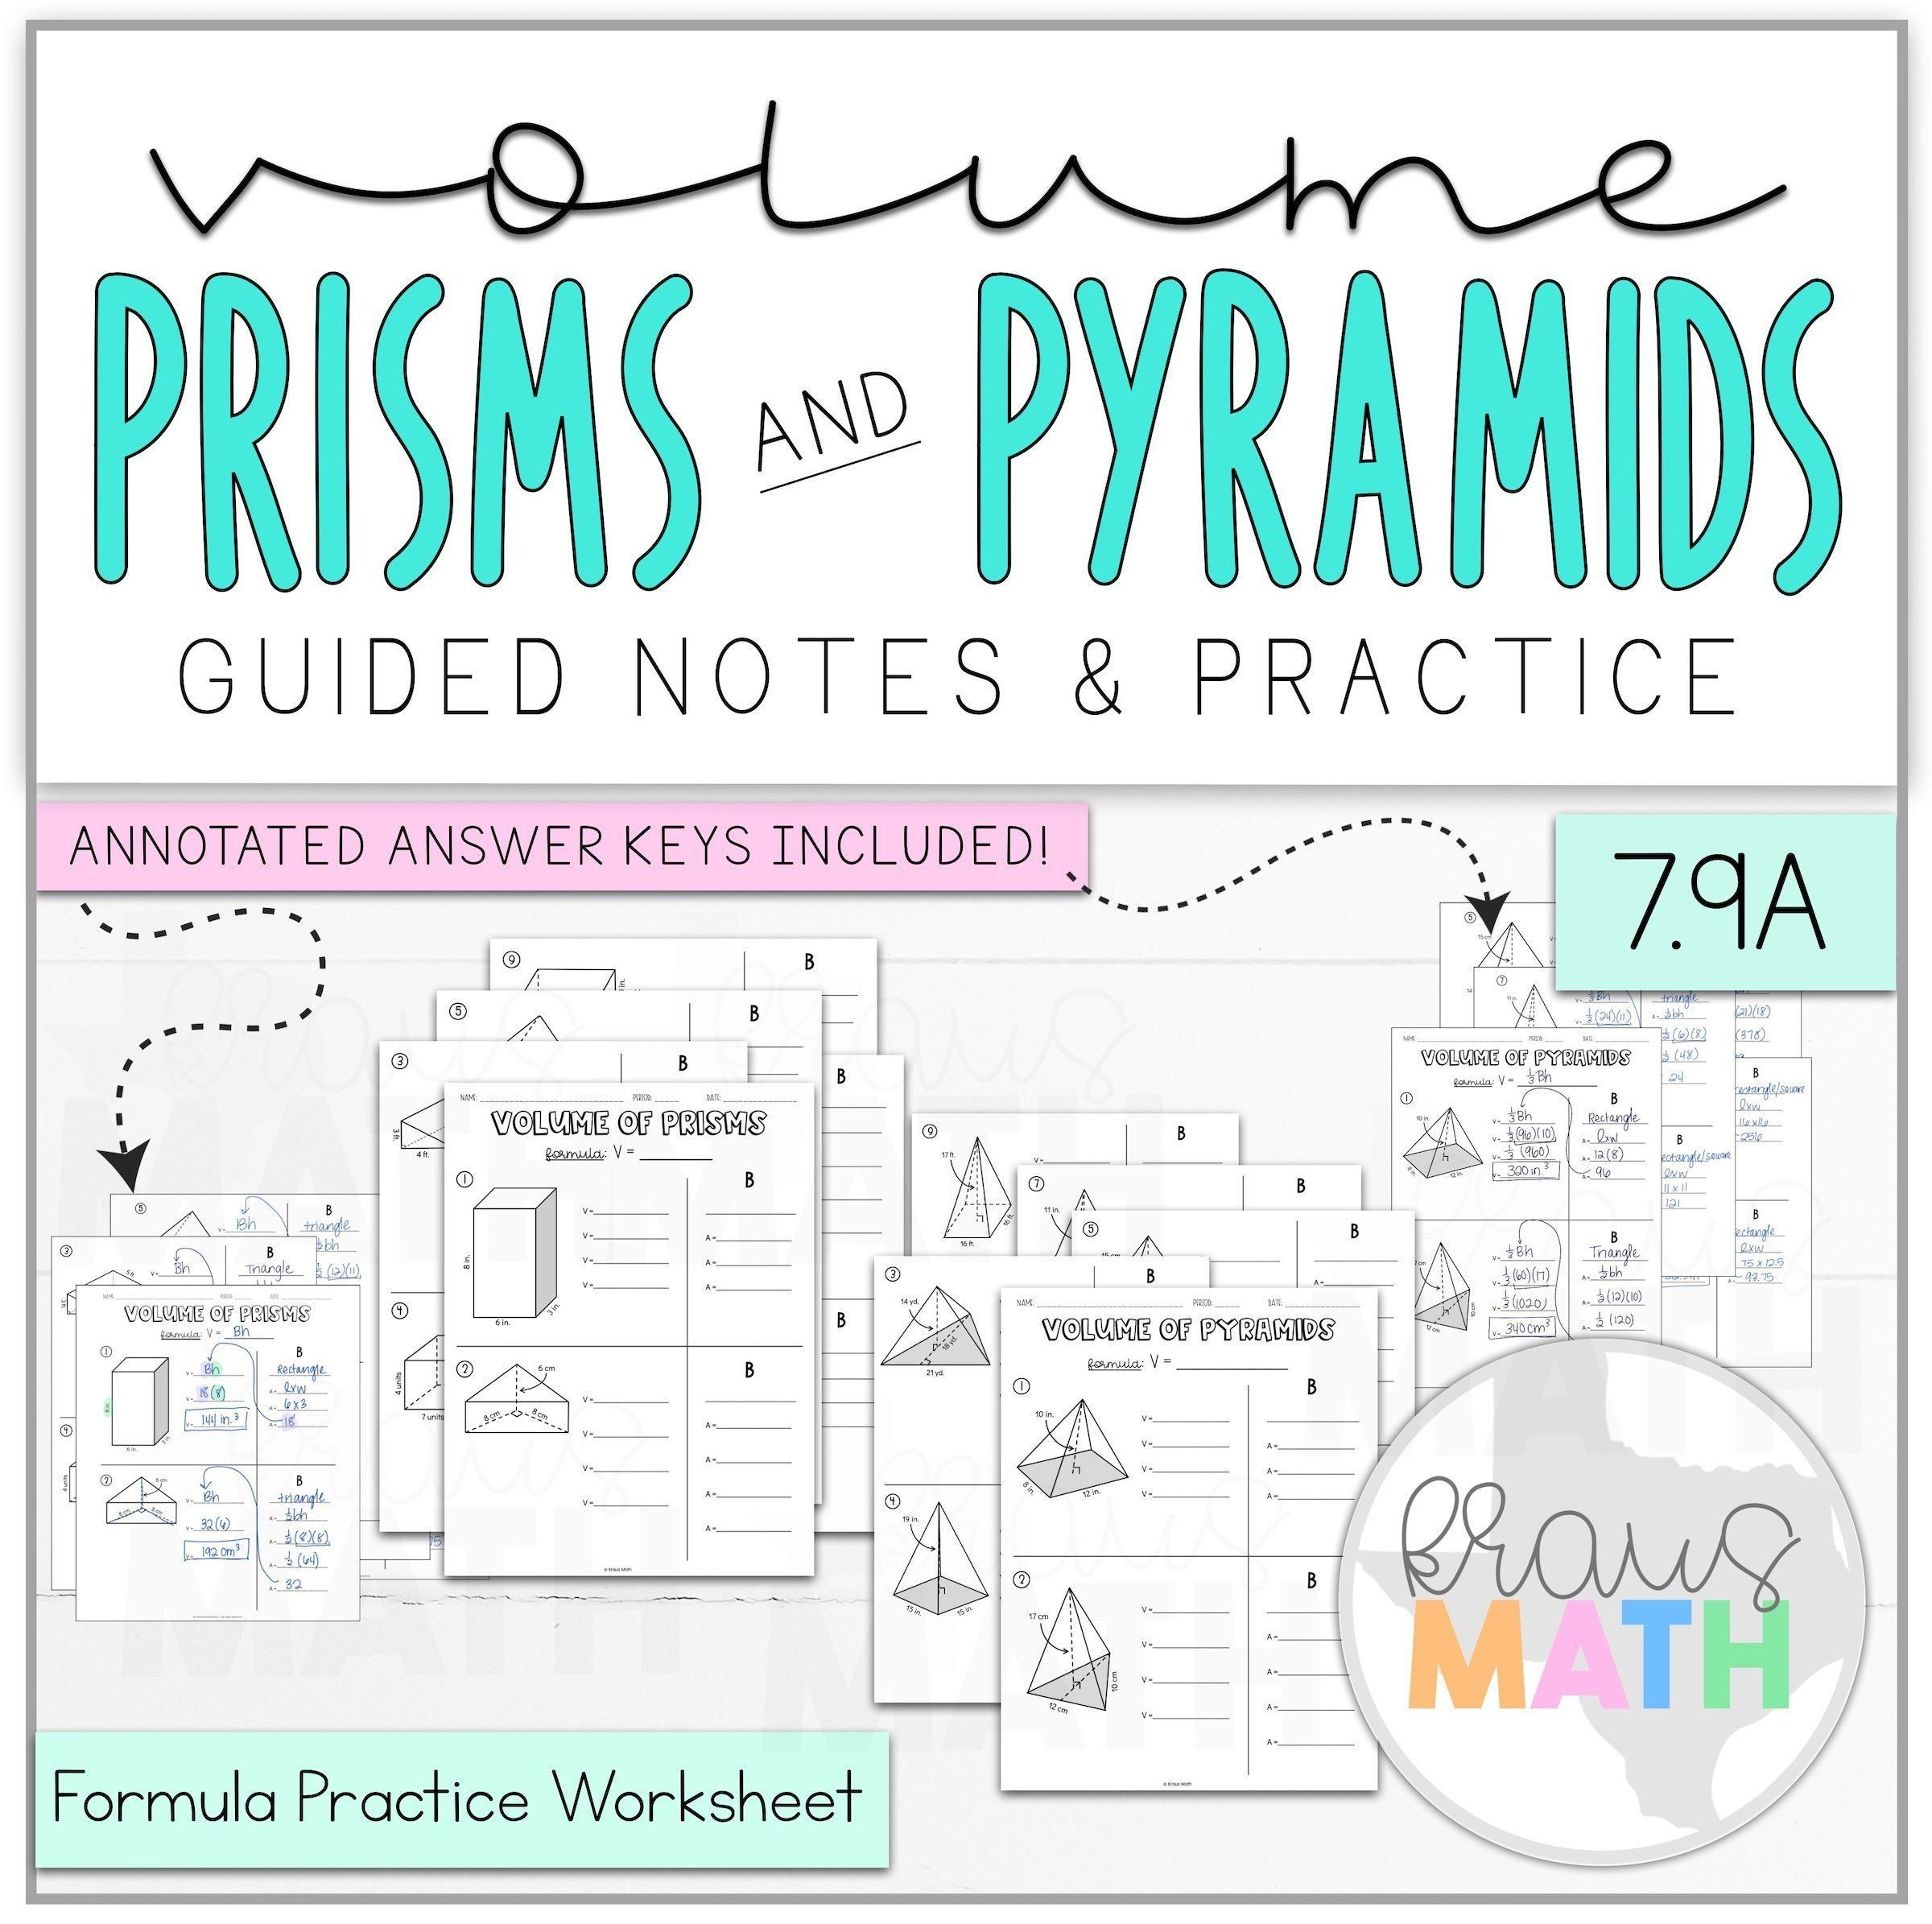 Volume Of Prism Worksheet Volume Of Prisms Amp Pyramids